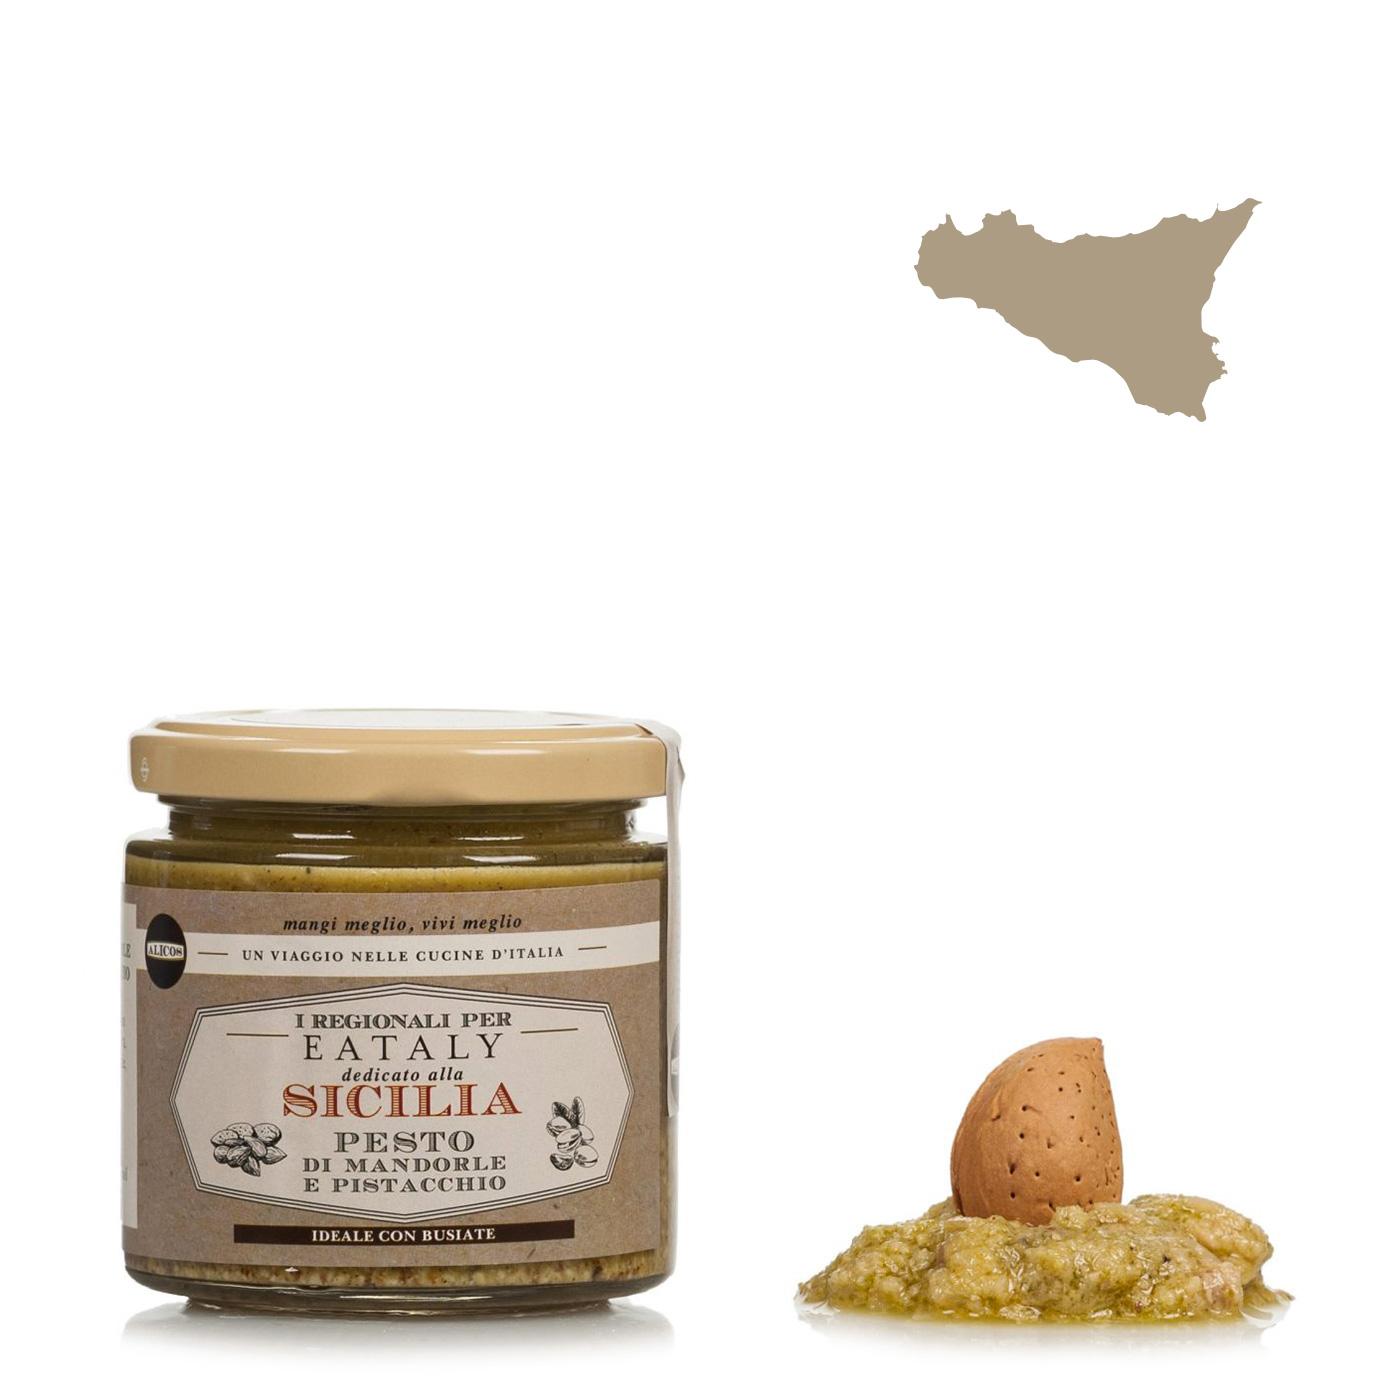 I Regionali per Eataly Pesto Pistacchi e Mandorle 220g